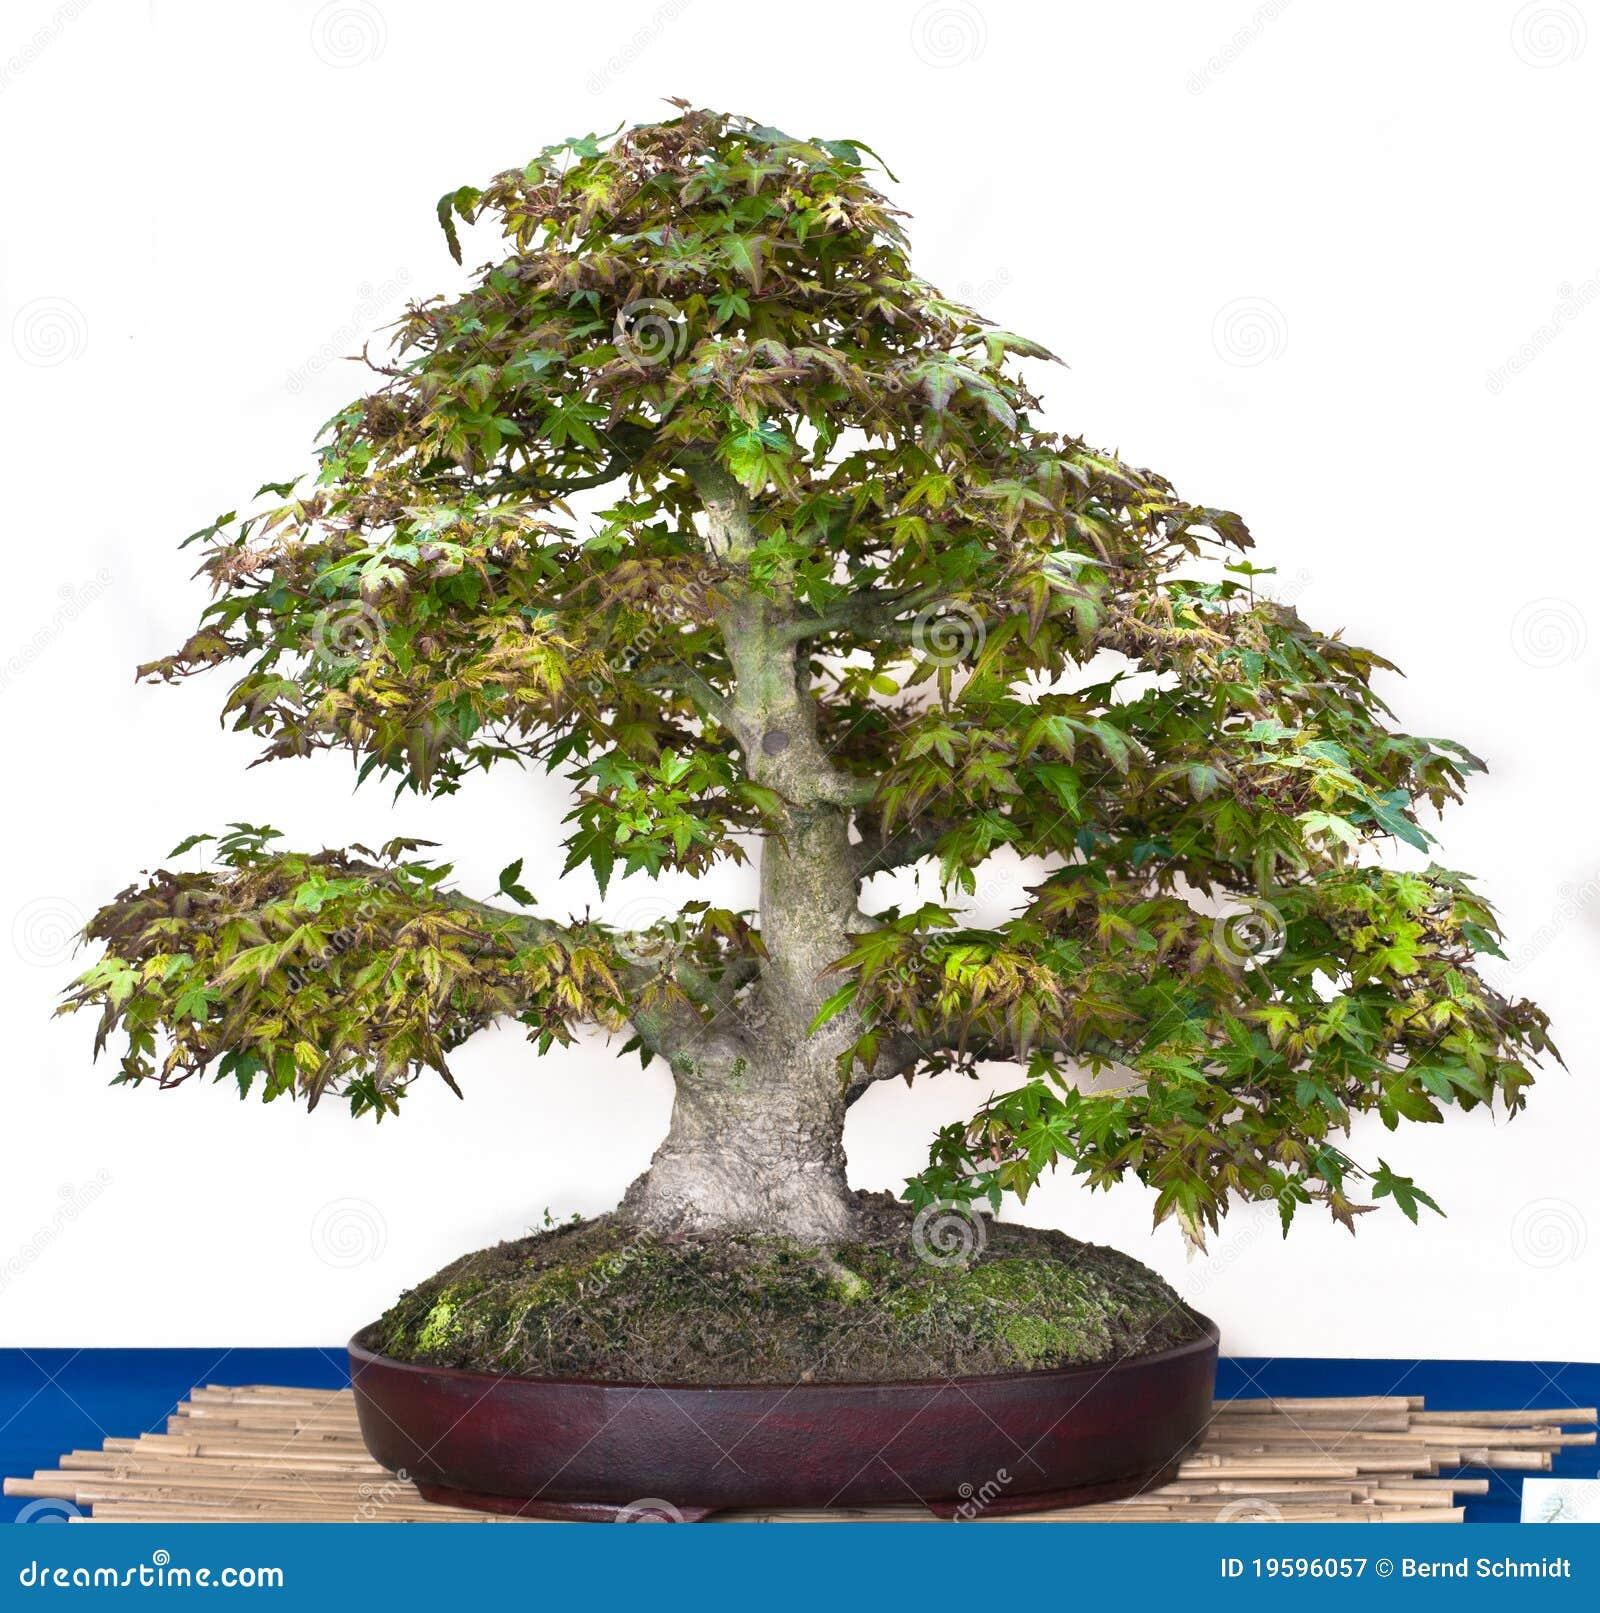 Acer Palmatum As Bonsai Tree Stock Image Image Of Buddhism Nature